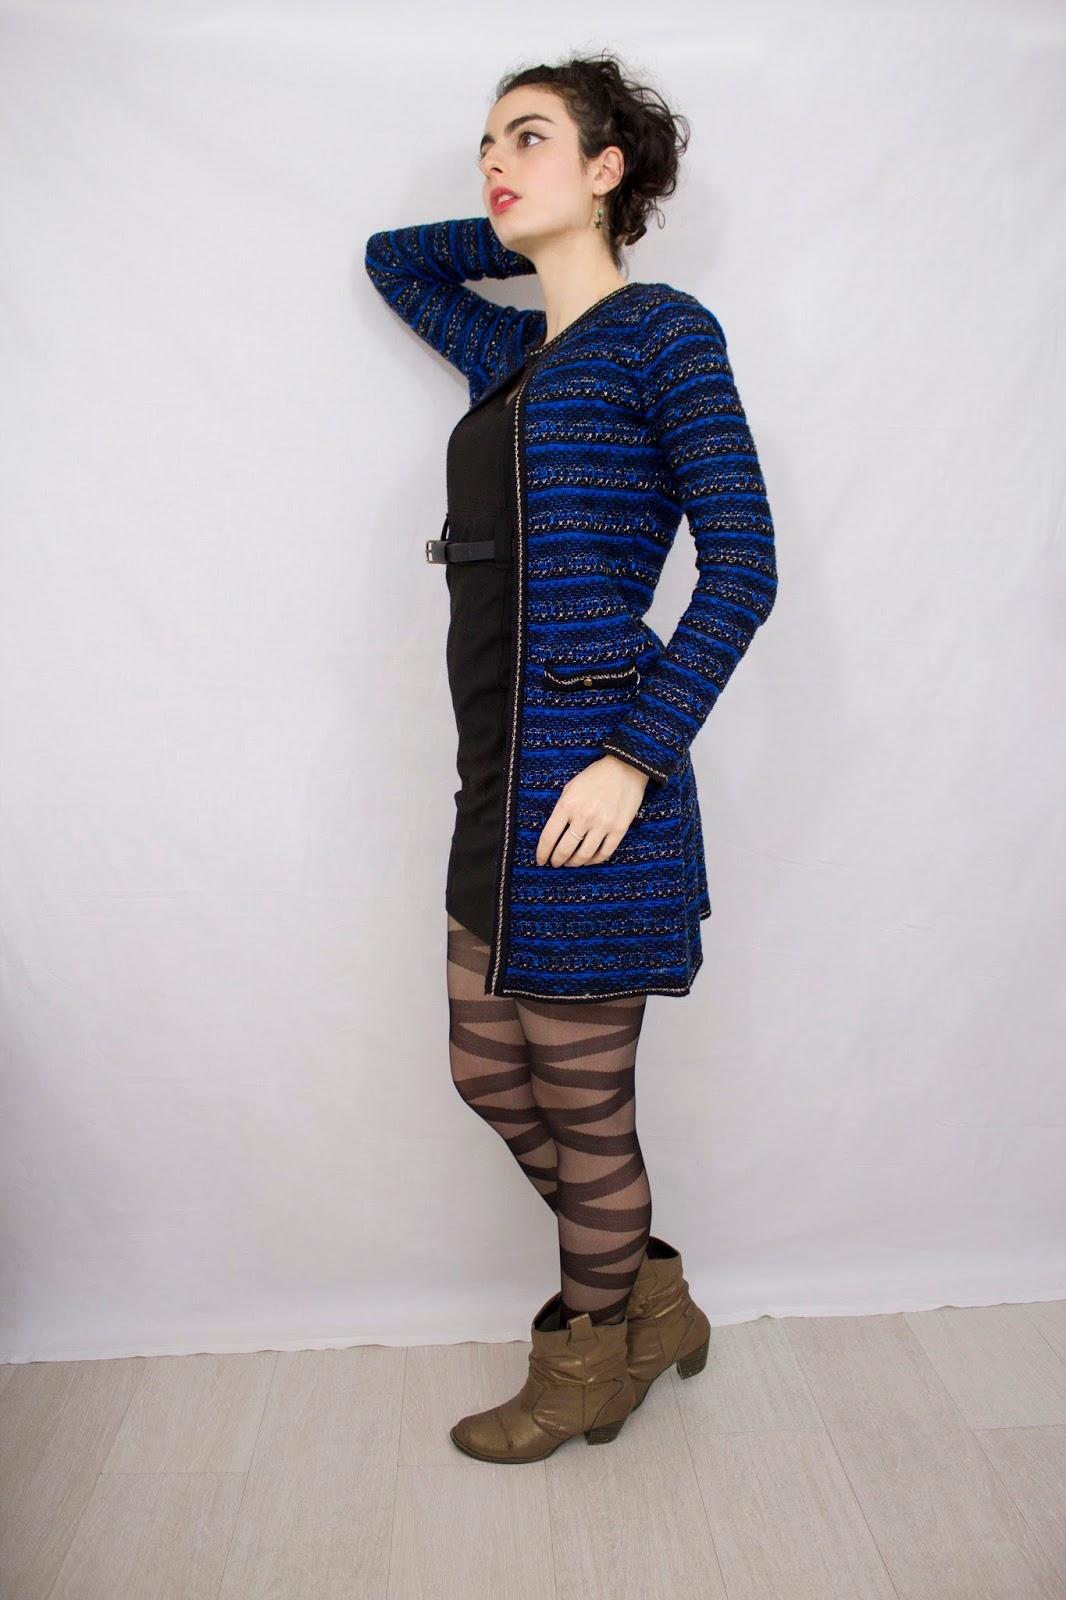 robe noire gilet bleu bottines dorées